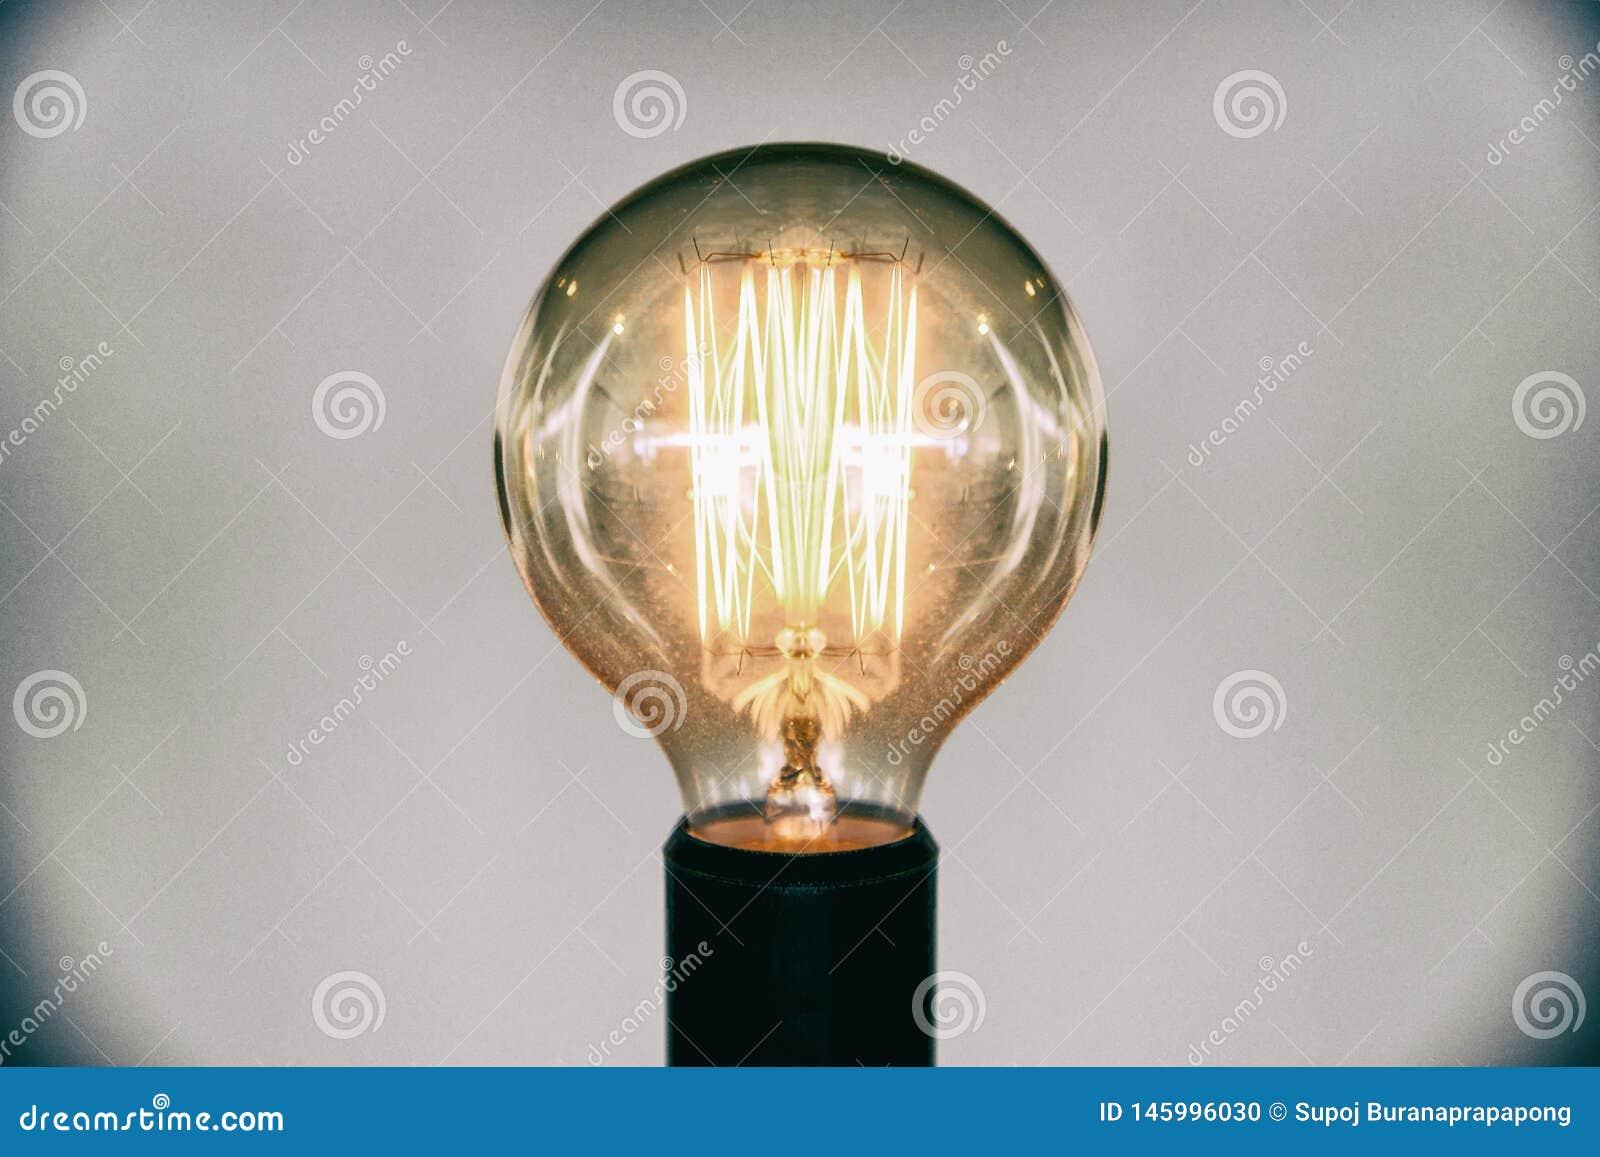 Decorative antique edison style light bulb.Beautiful retro luxury light lamp decor glowing selective focus film grain style effect